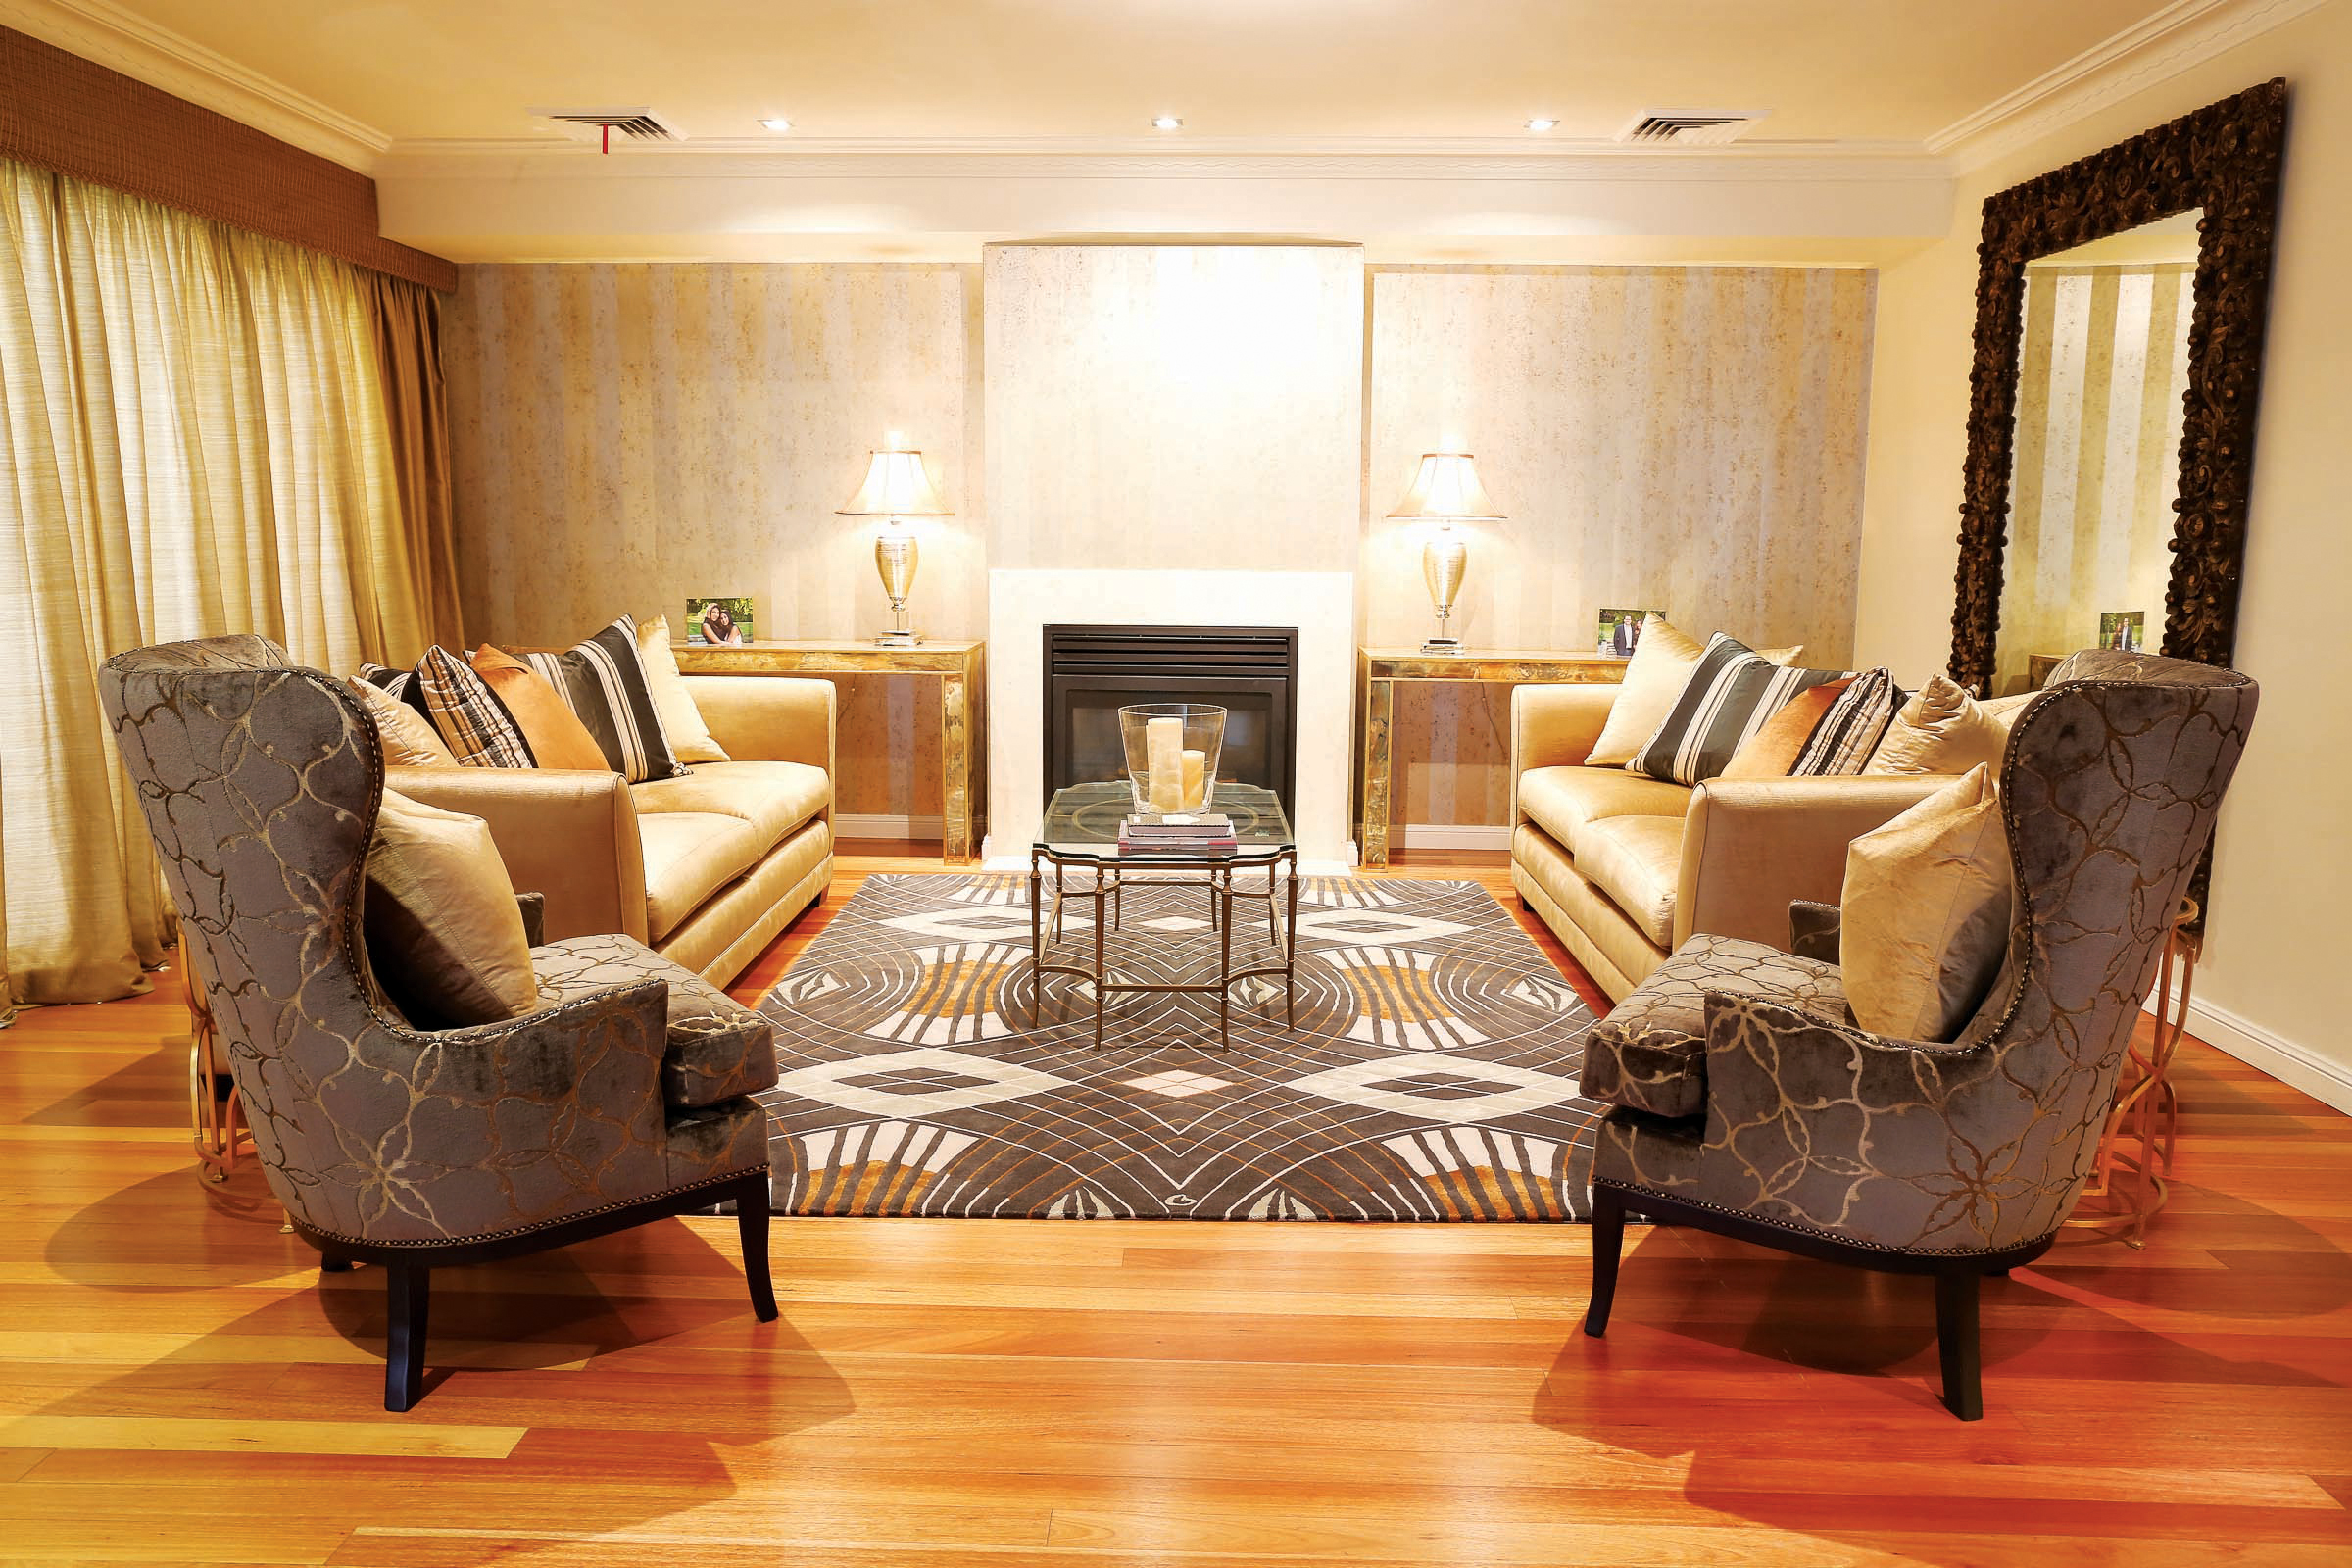 Formal lounge designed by Susan Svoboda of Saltbox Furniture & Interior Design Studio